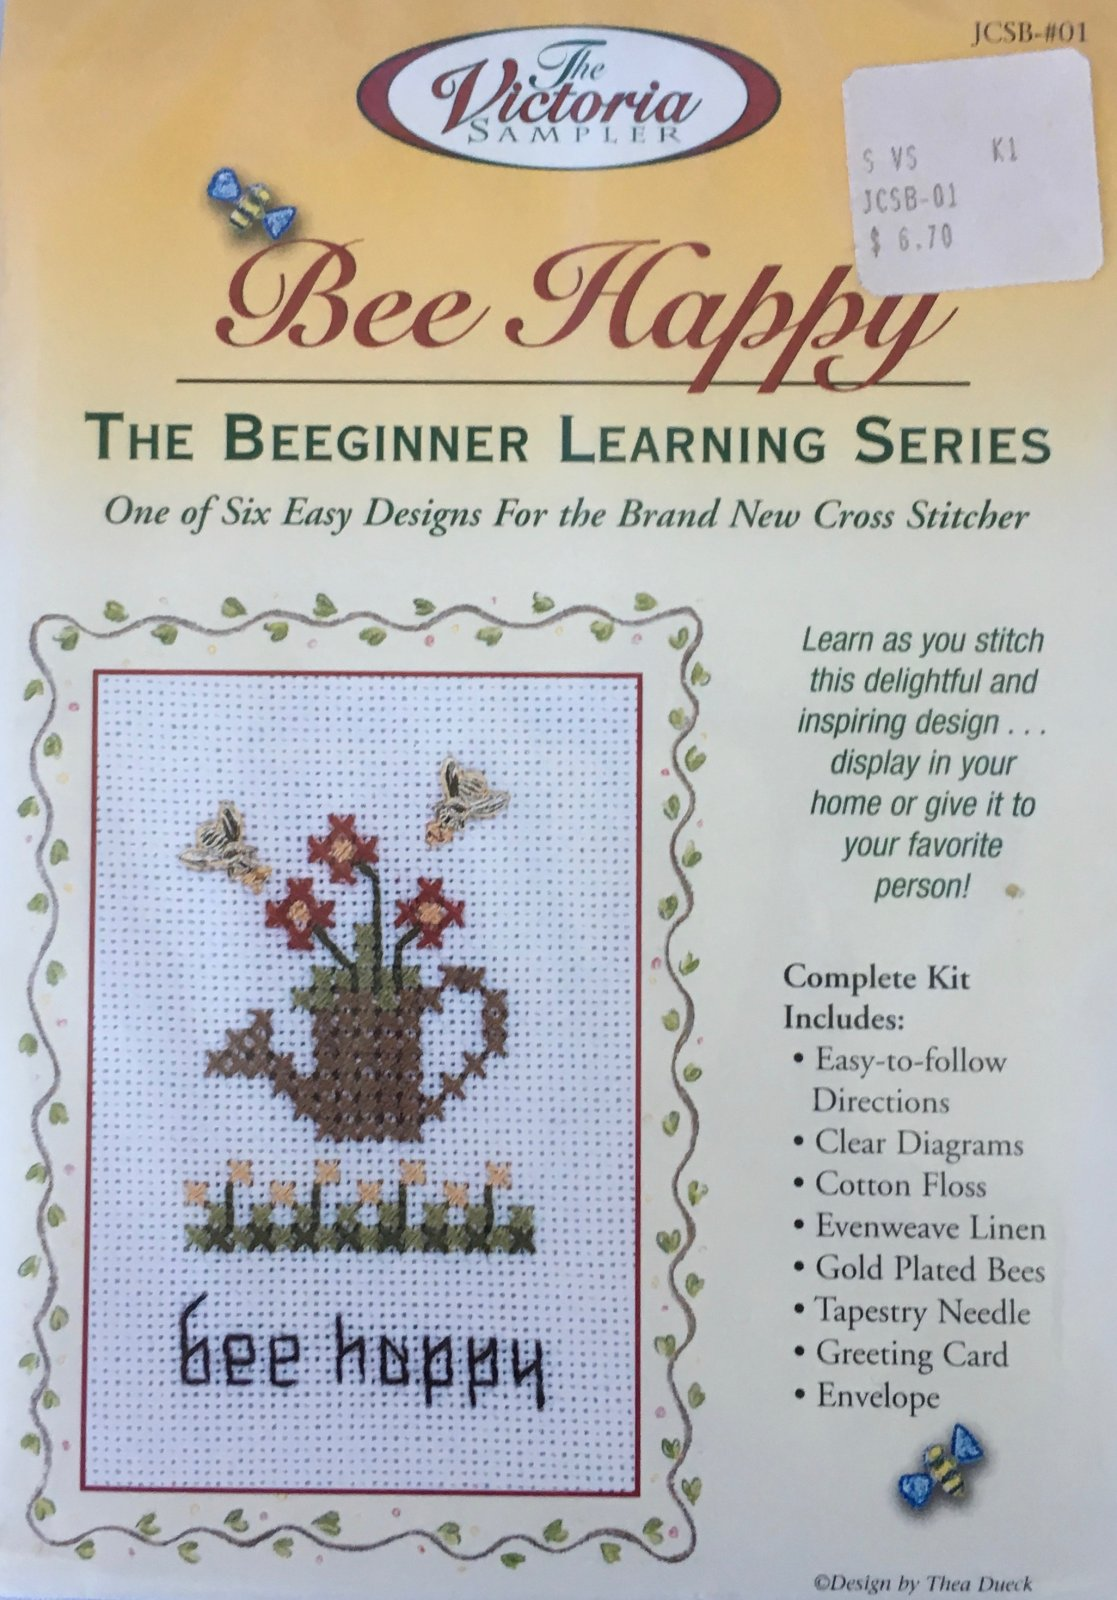 The Victoria Sampler: Bee Happy Kit JCSB-#01